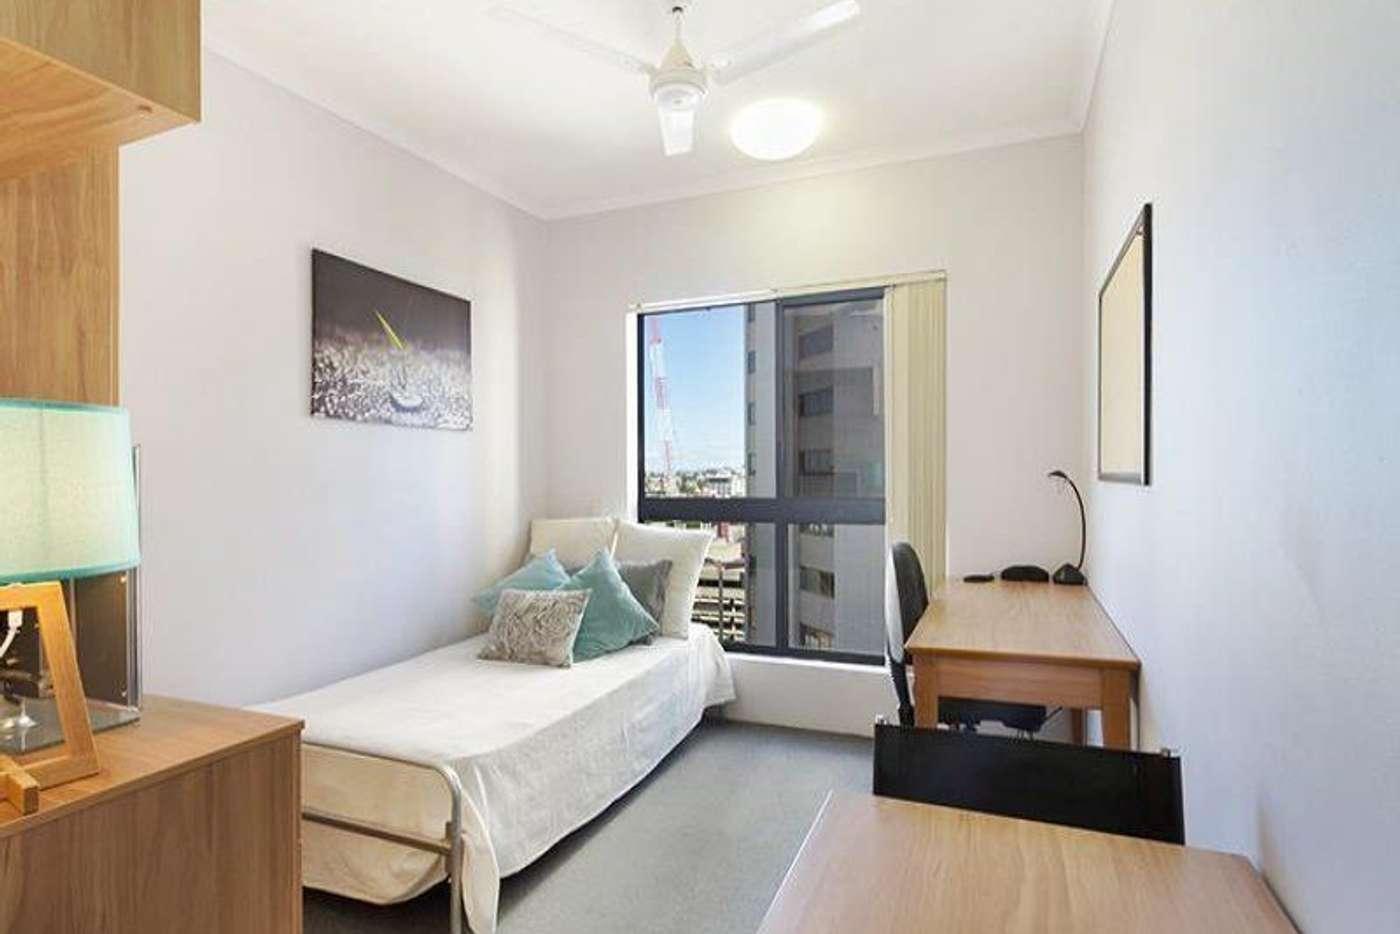 Main view of Homely studio listing, 2001/108 Margaret Street, Brisbane City QLD 4000